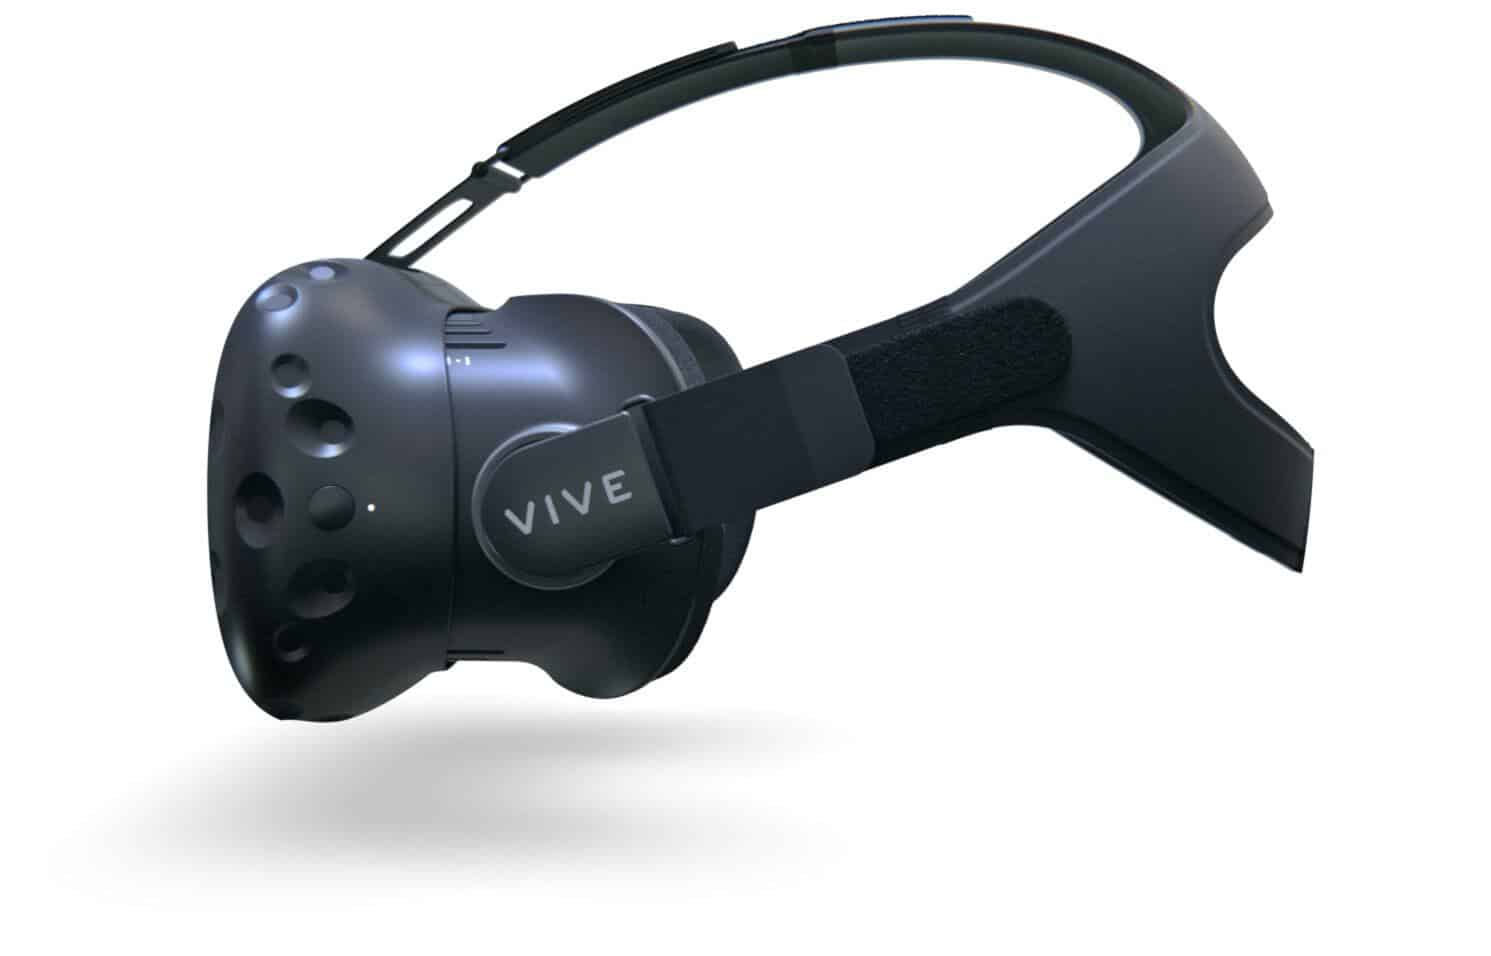 HTC Vive - Snart i en arkadhall nära dig